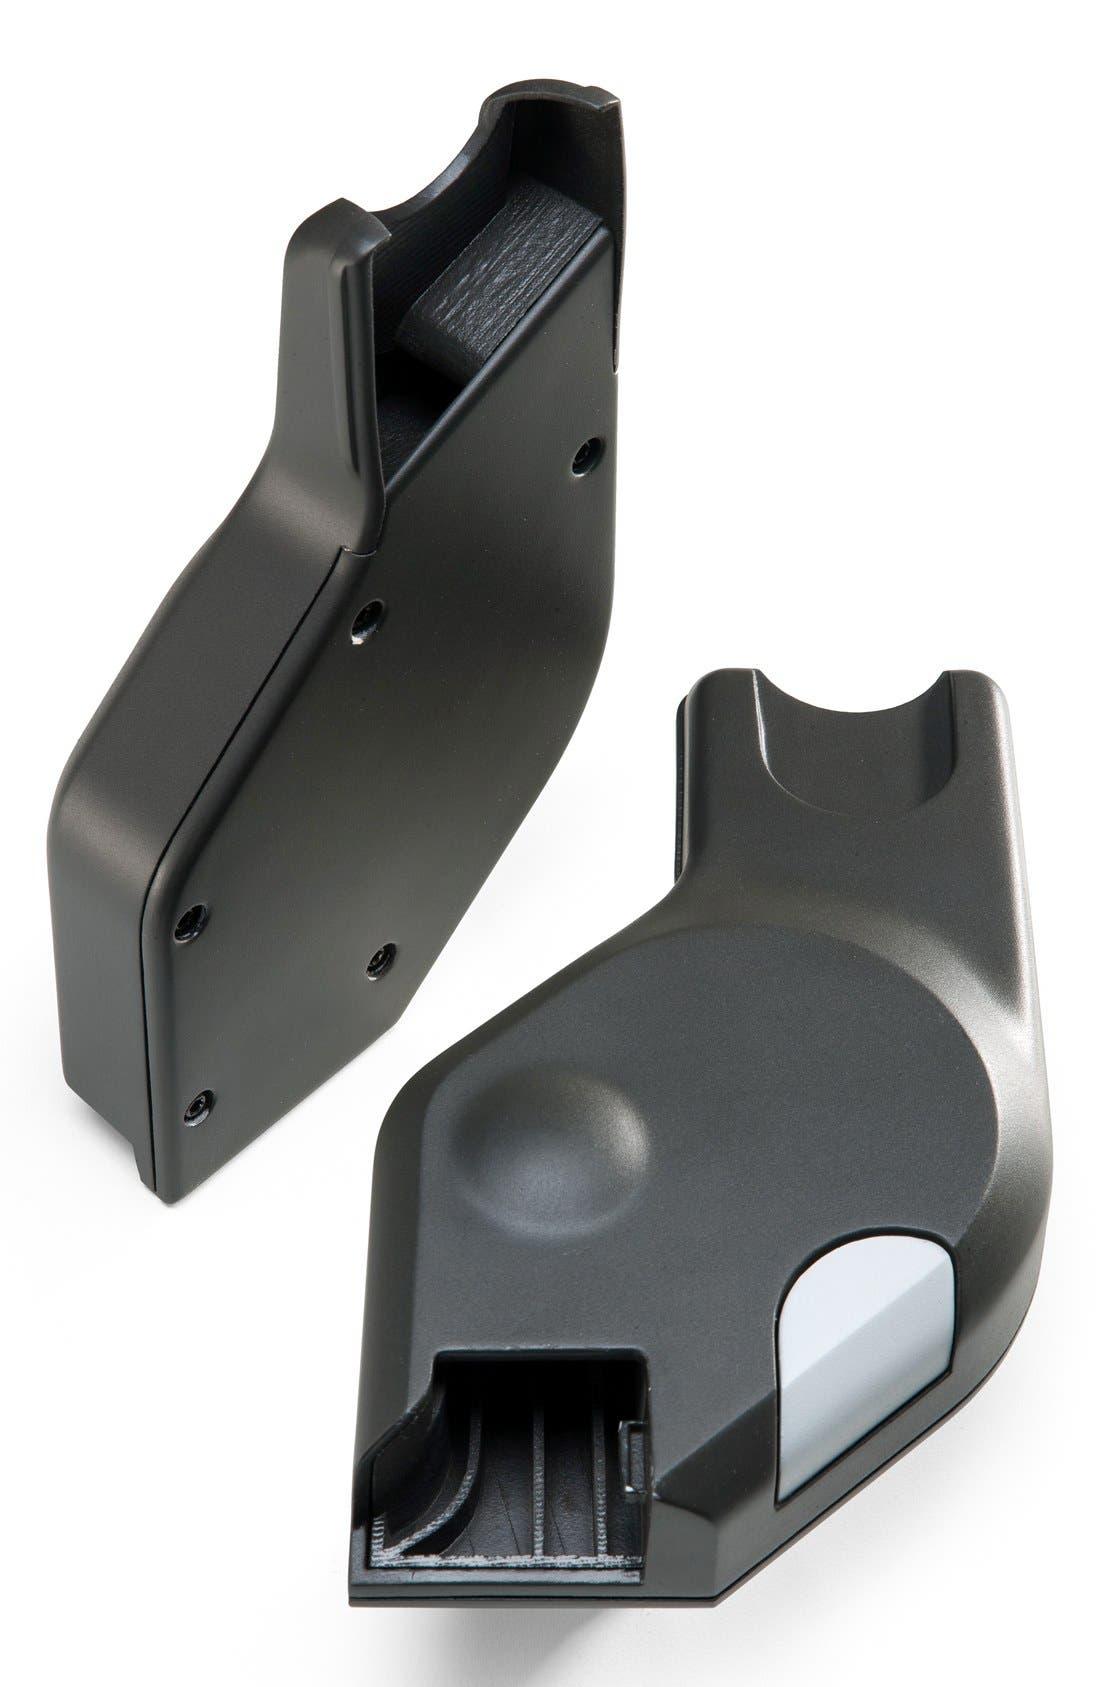 Alternate Image 1 Selected - Stokke 'Xplory®' & Stokke 'Scoot' Car Seat Adaptor for Maxi Cosi & Nuna